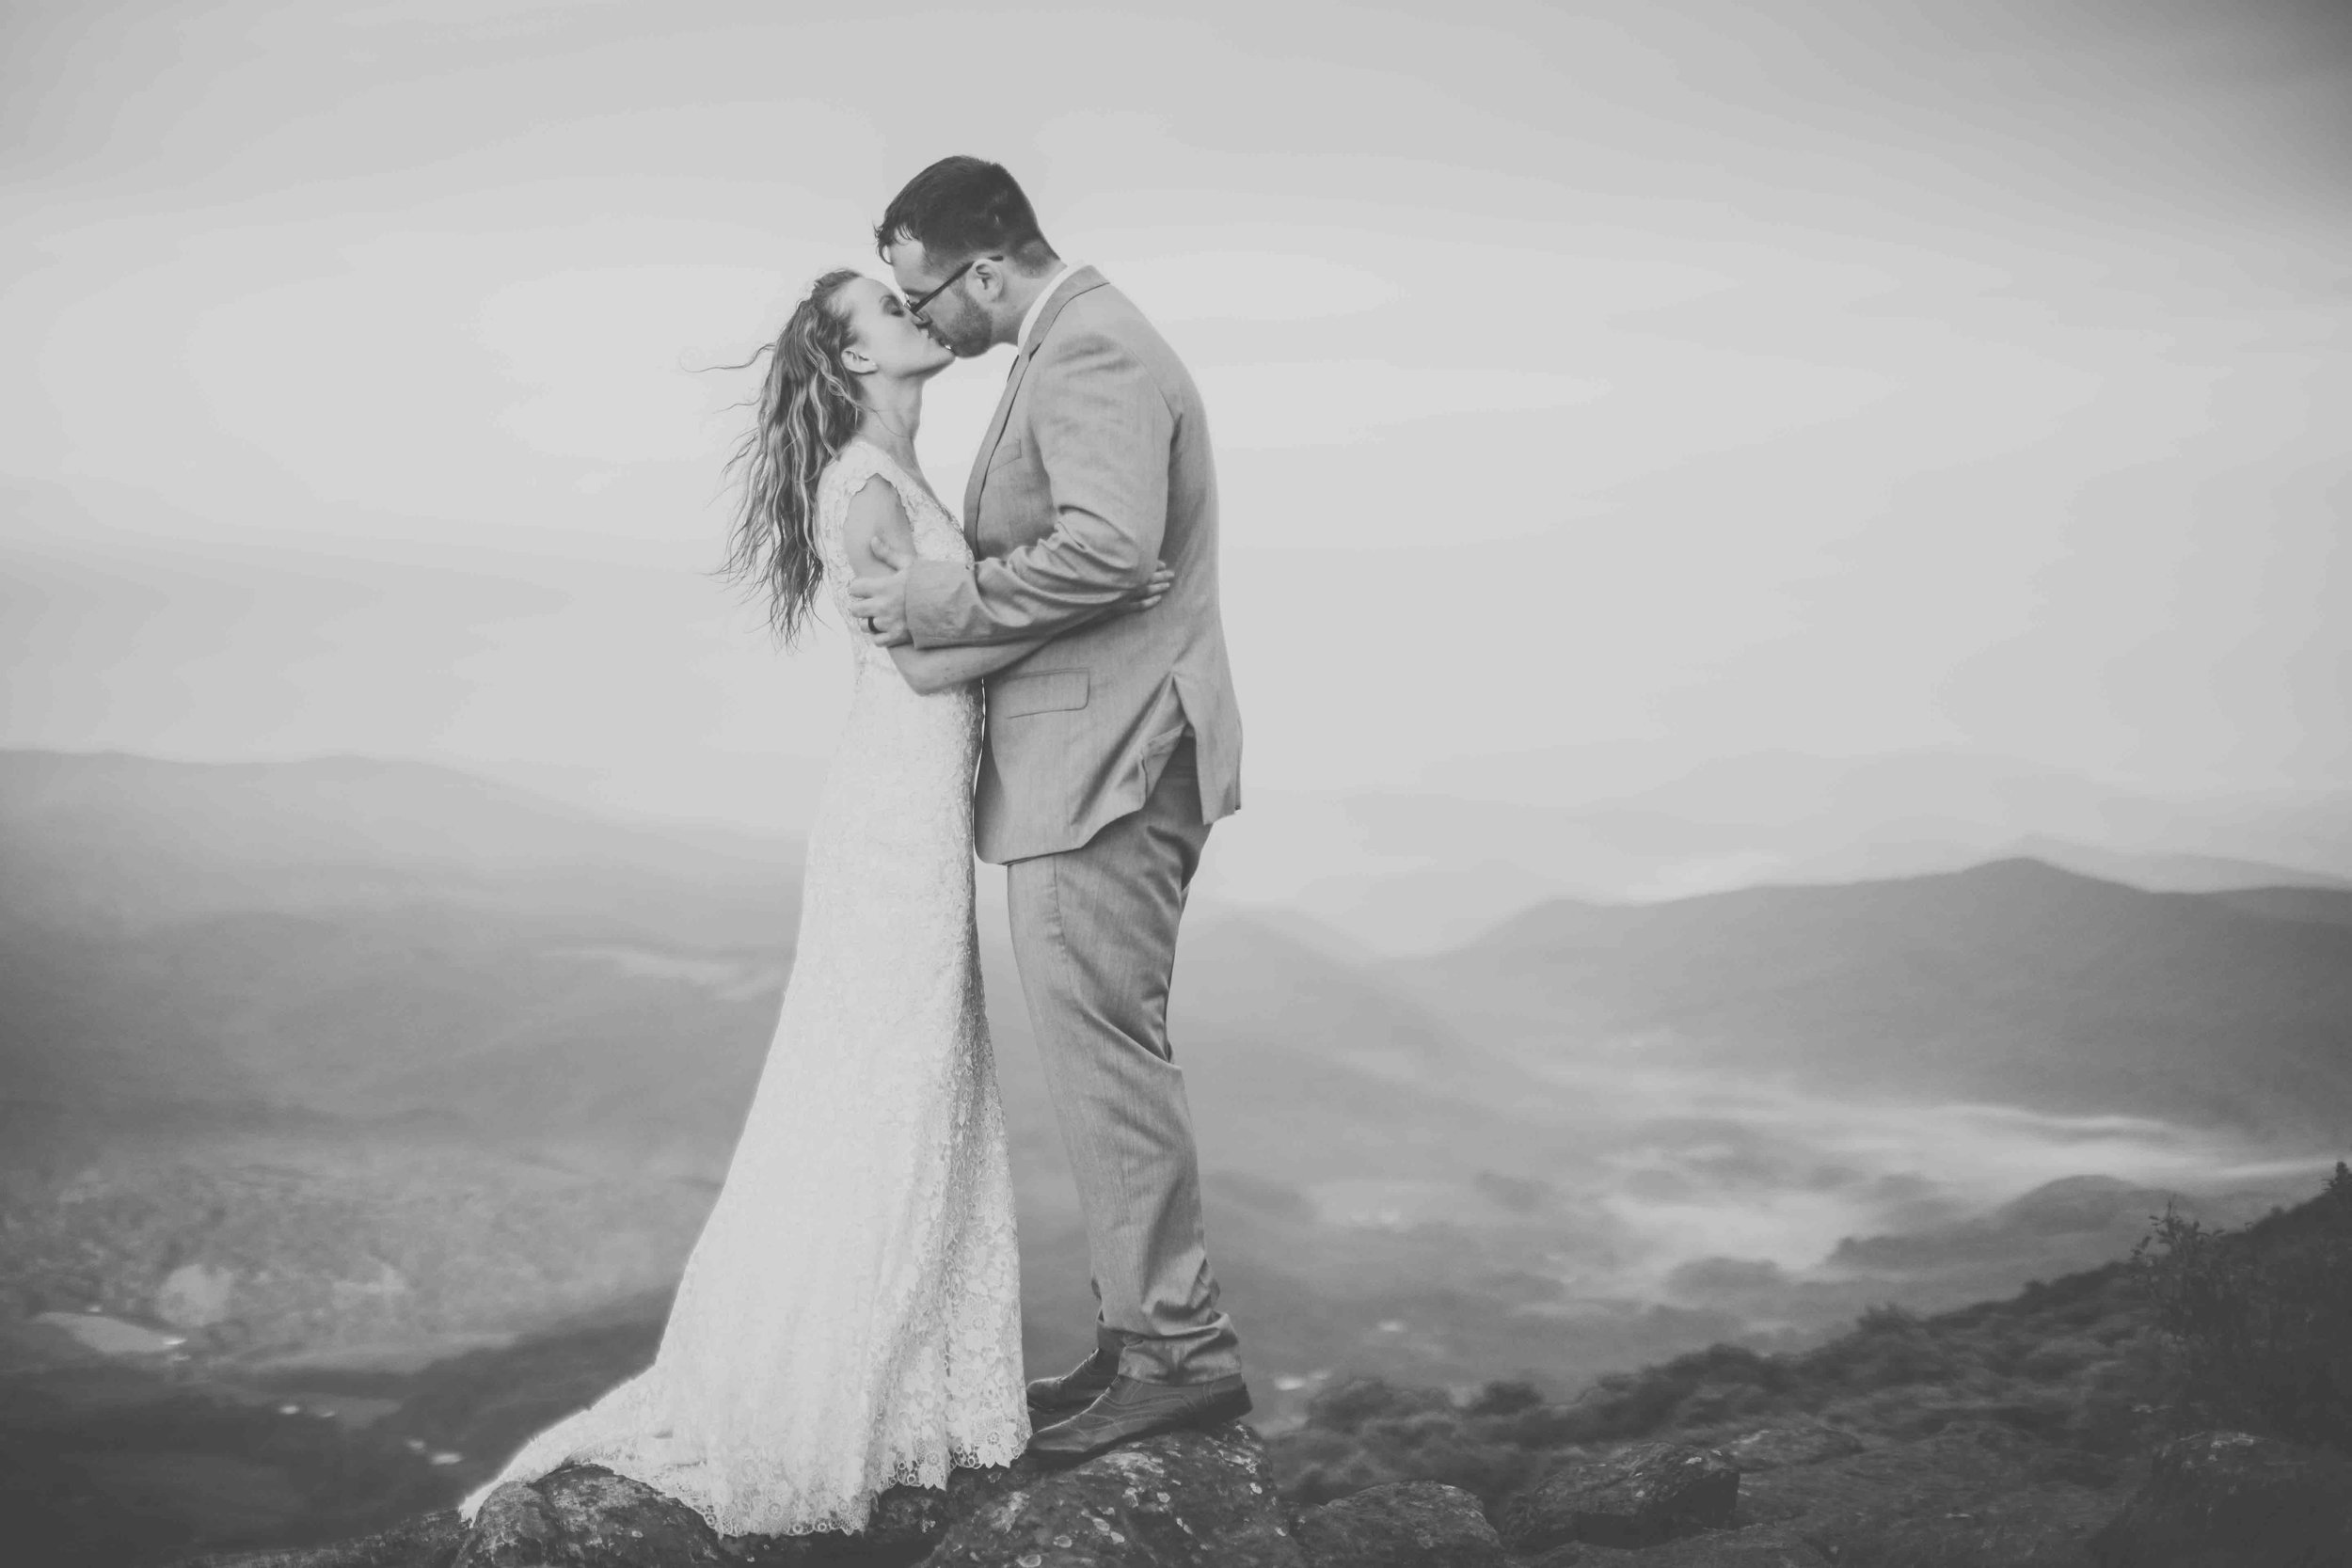 north-carolina-elopement-photographer-73.jpg